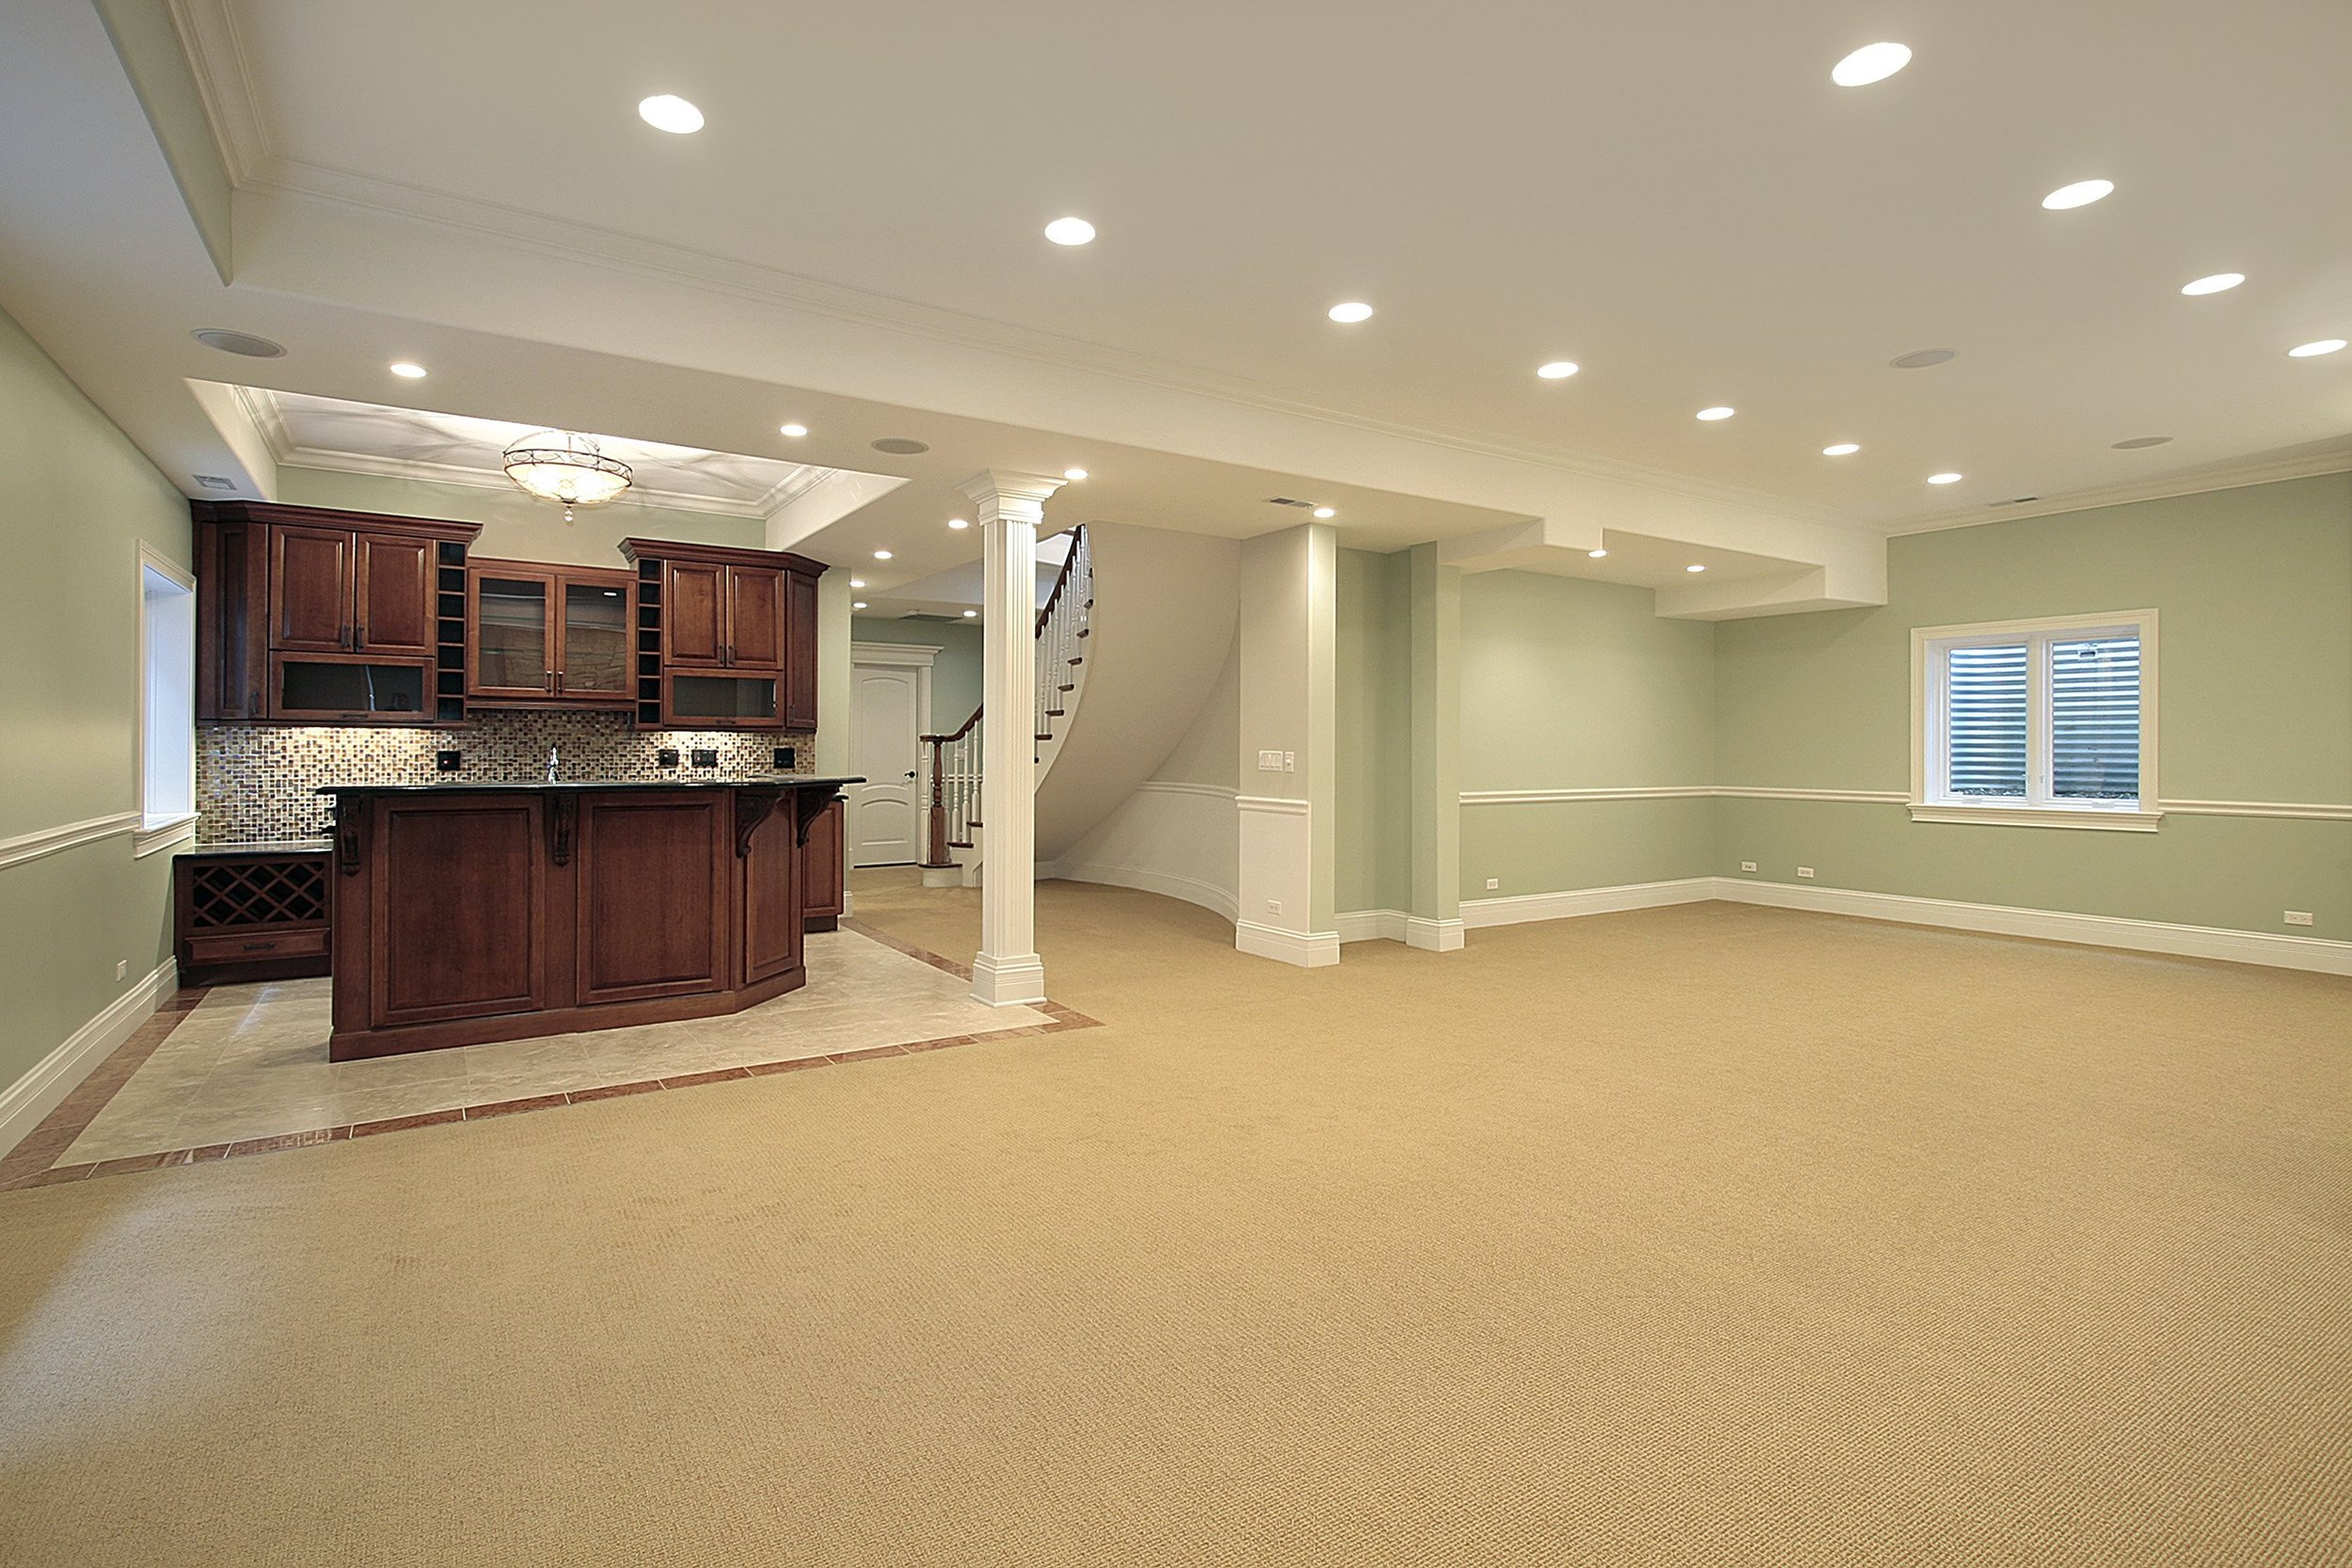 basement-flooring-options-over-concrete-remodeled-basements-inexpensive-basement-finishing-ideas-drop-ceilings-for-basements-basement-lau.jpg